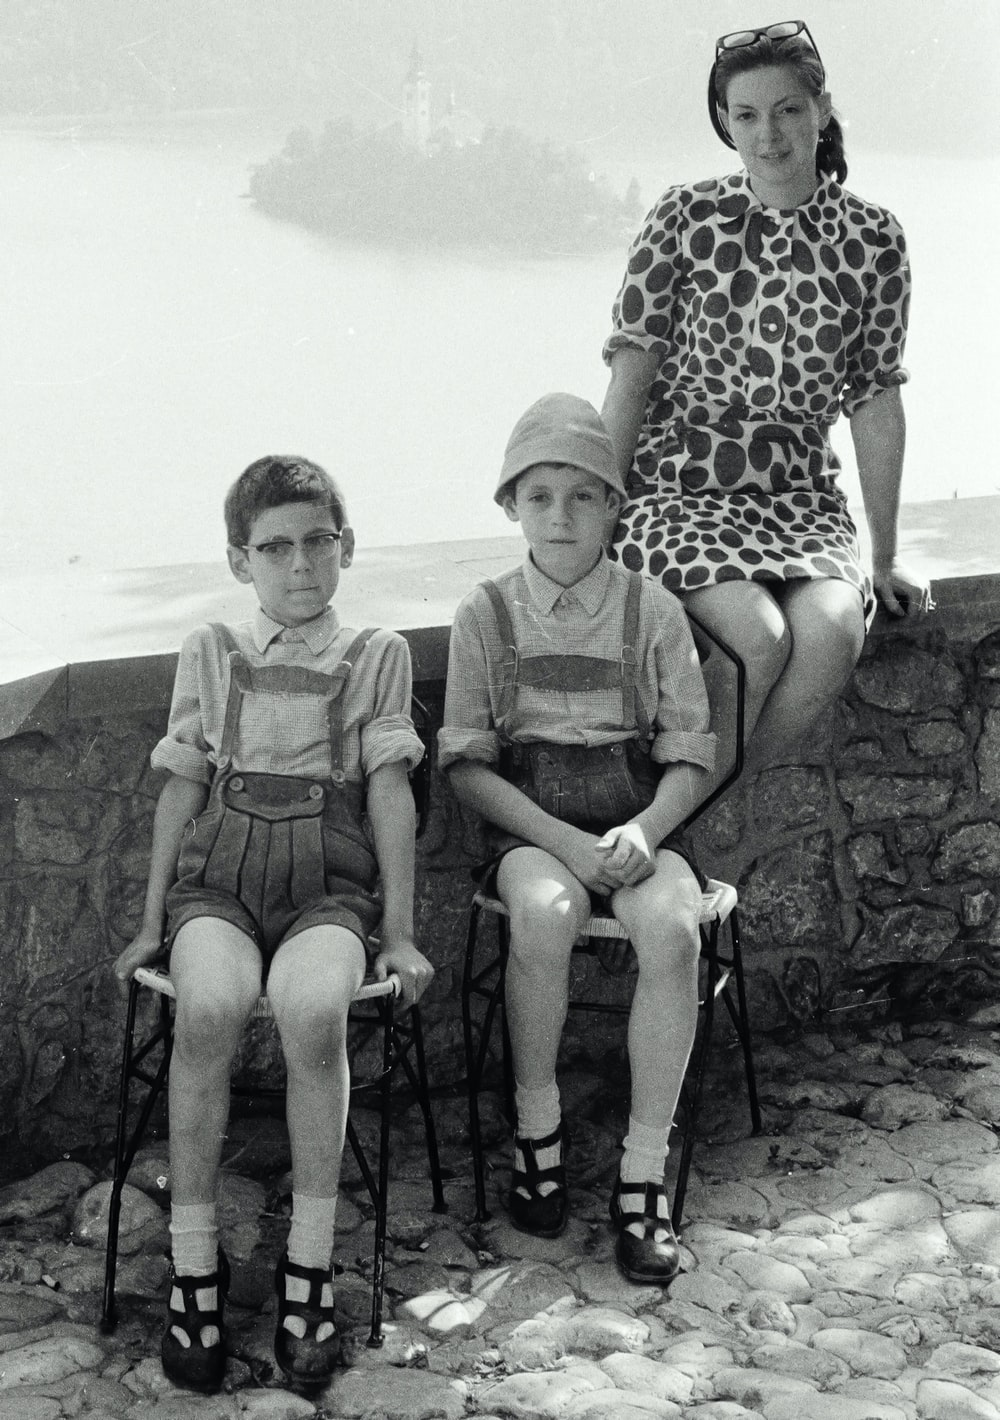 grayscale photo of 2 women sitting on rock